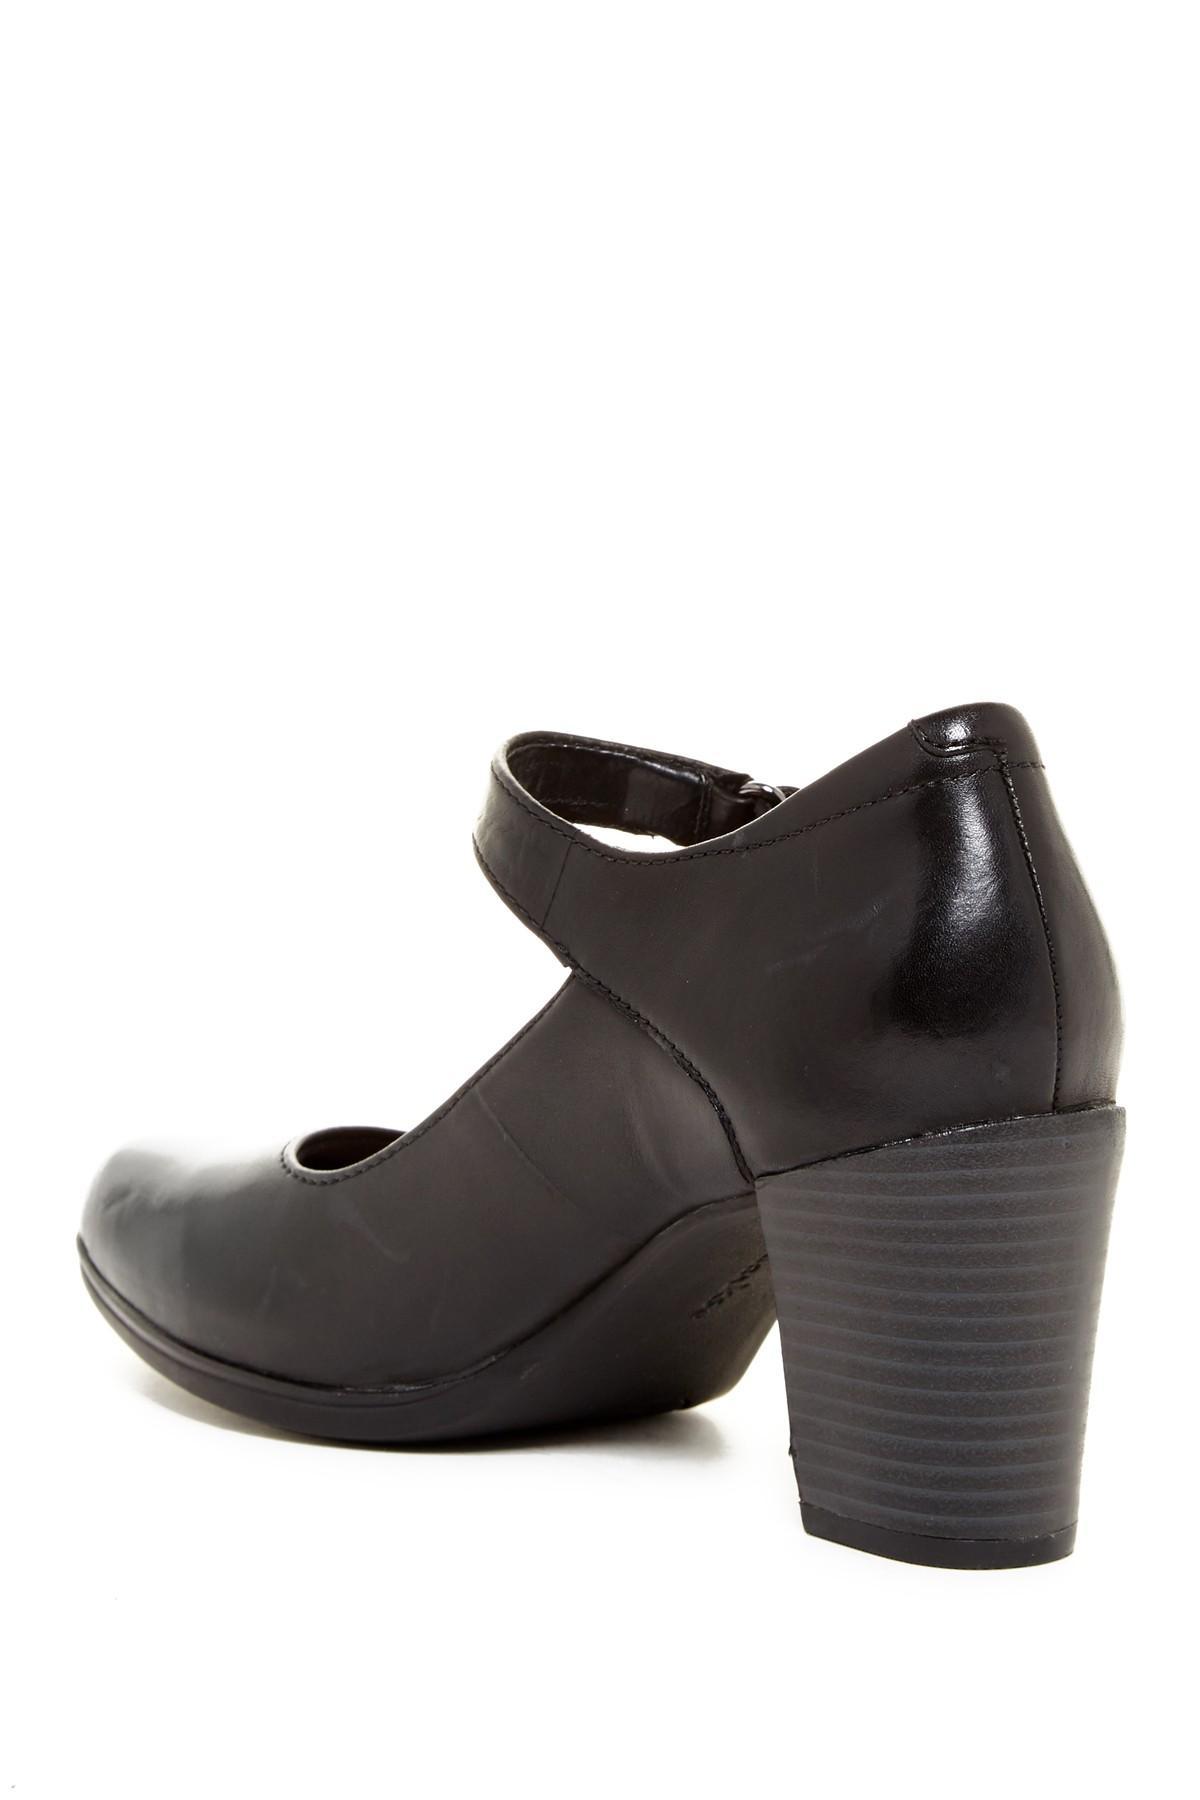 Clarks Shoes Women Pump Nordstrom